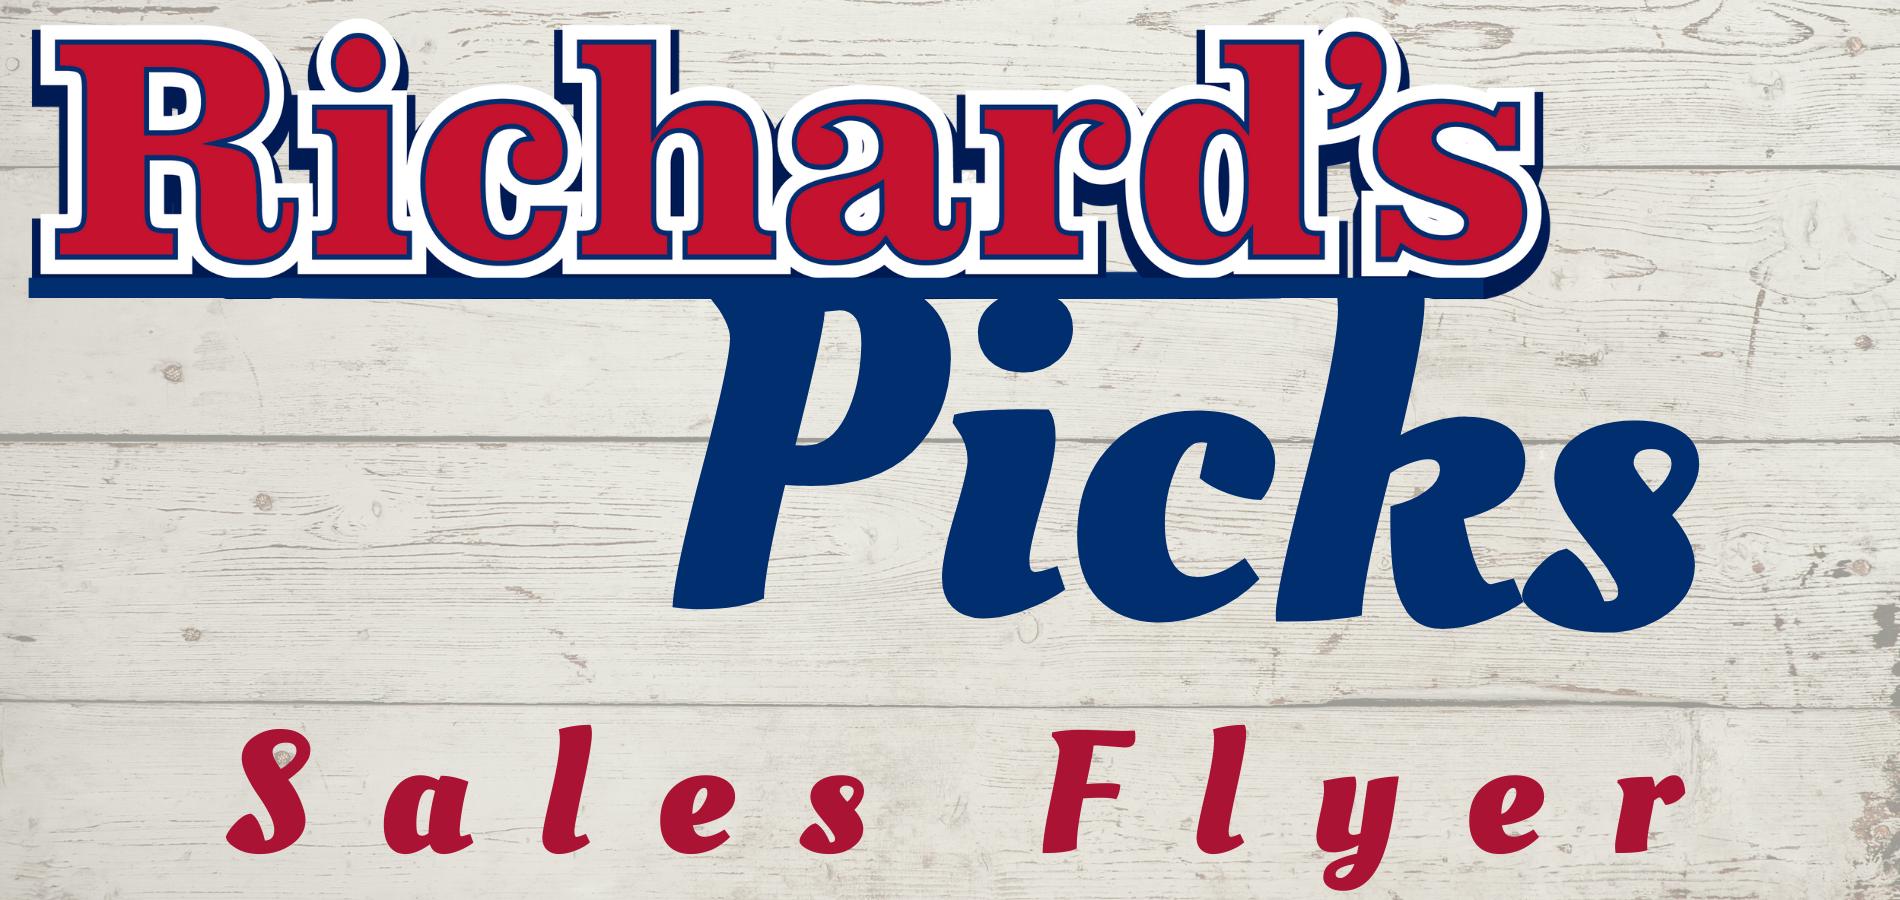 Richard's Picks Button Image (1)